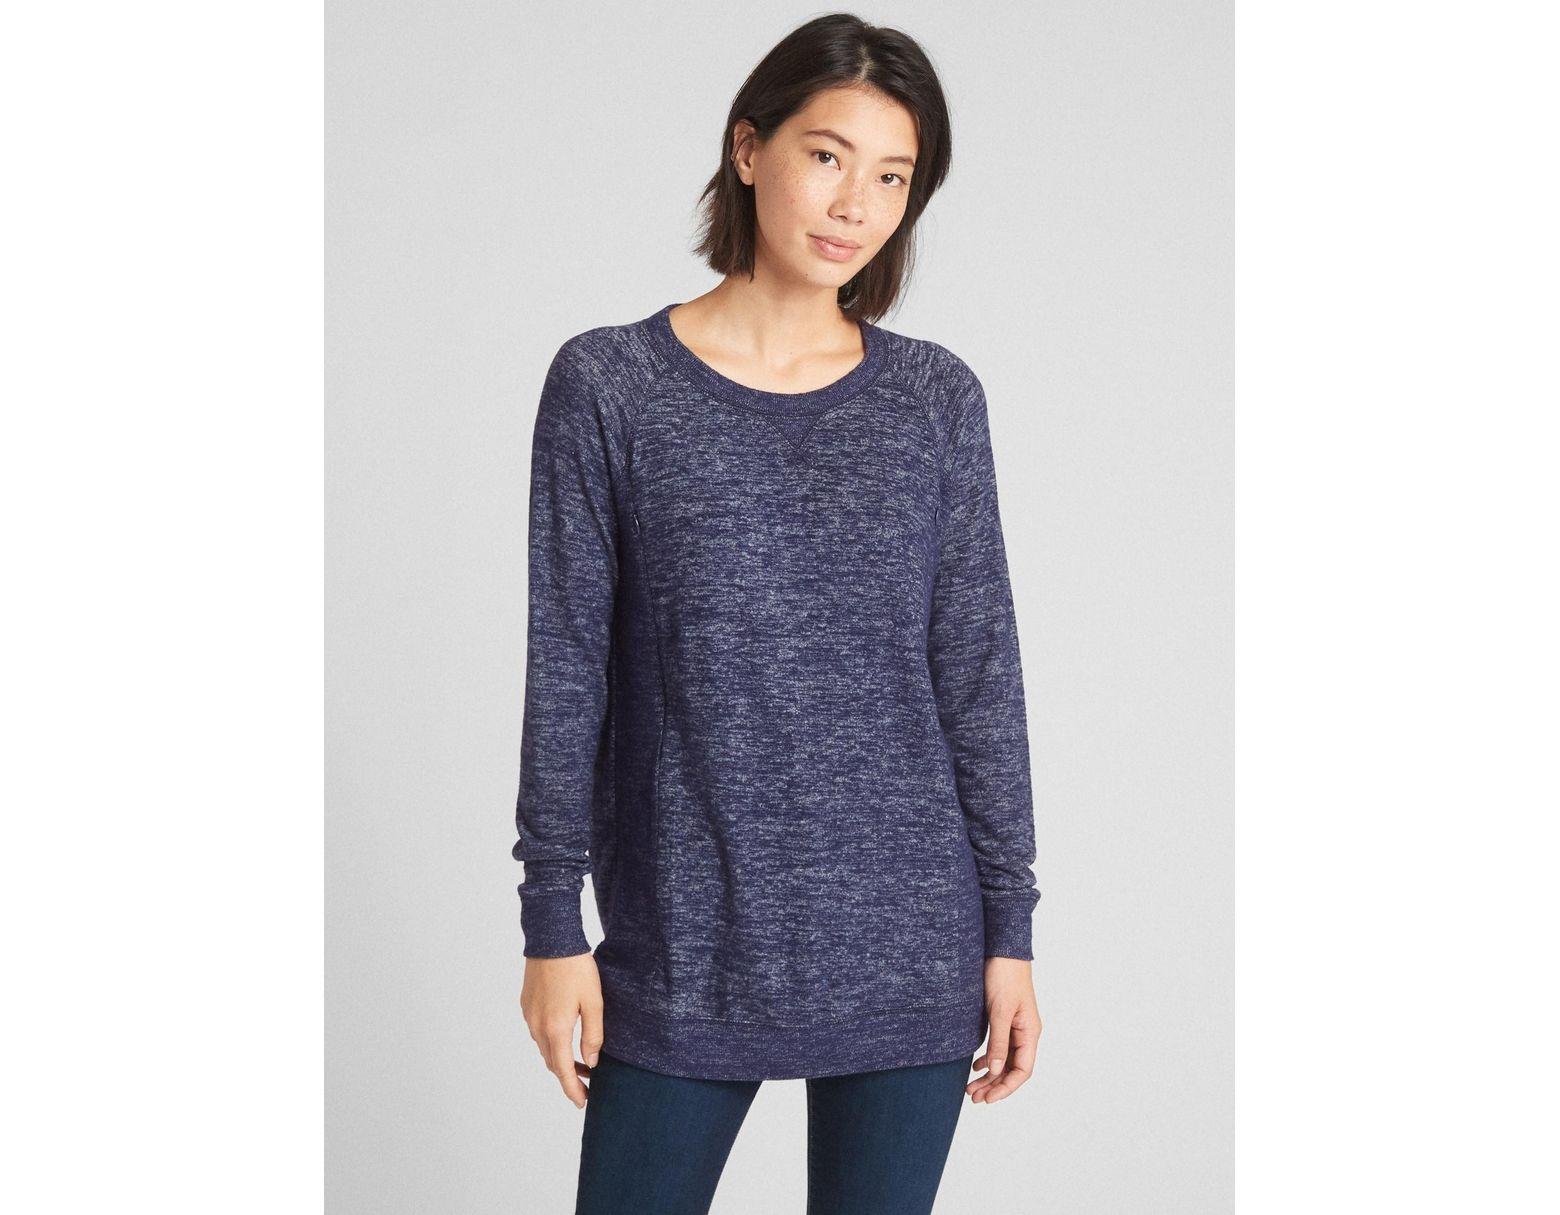 c39589c923c1e Gap Maternity Marled Nursing Pullover Sweatshirt in Blue - Lyst